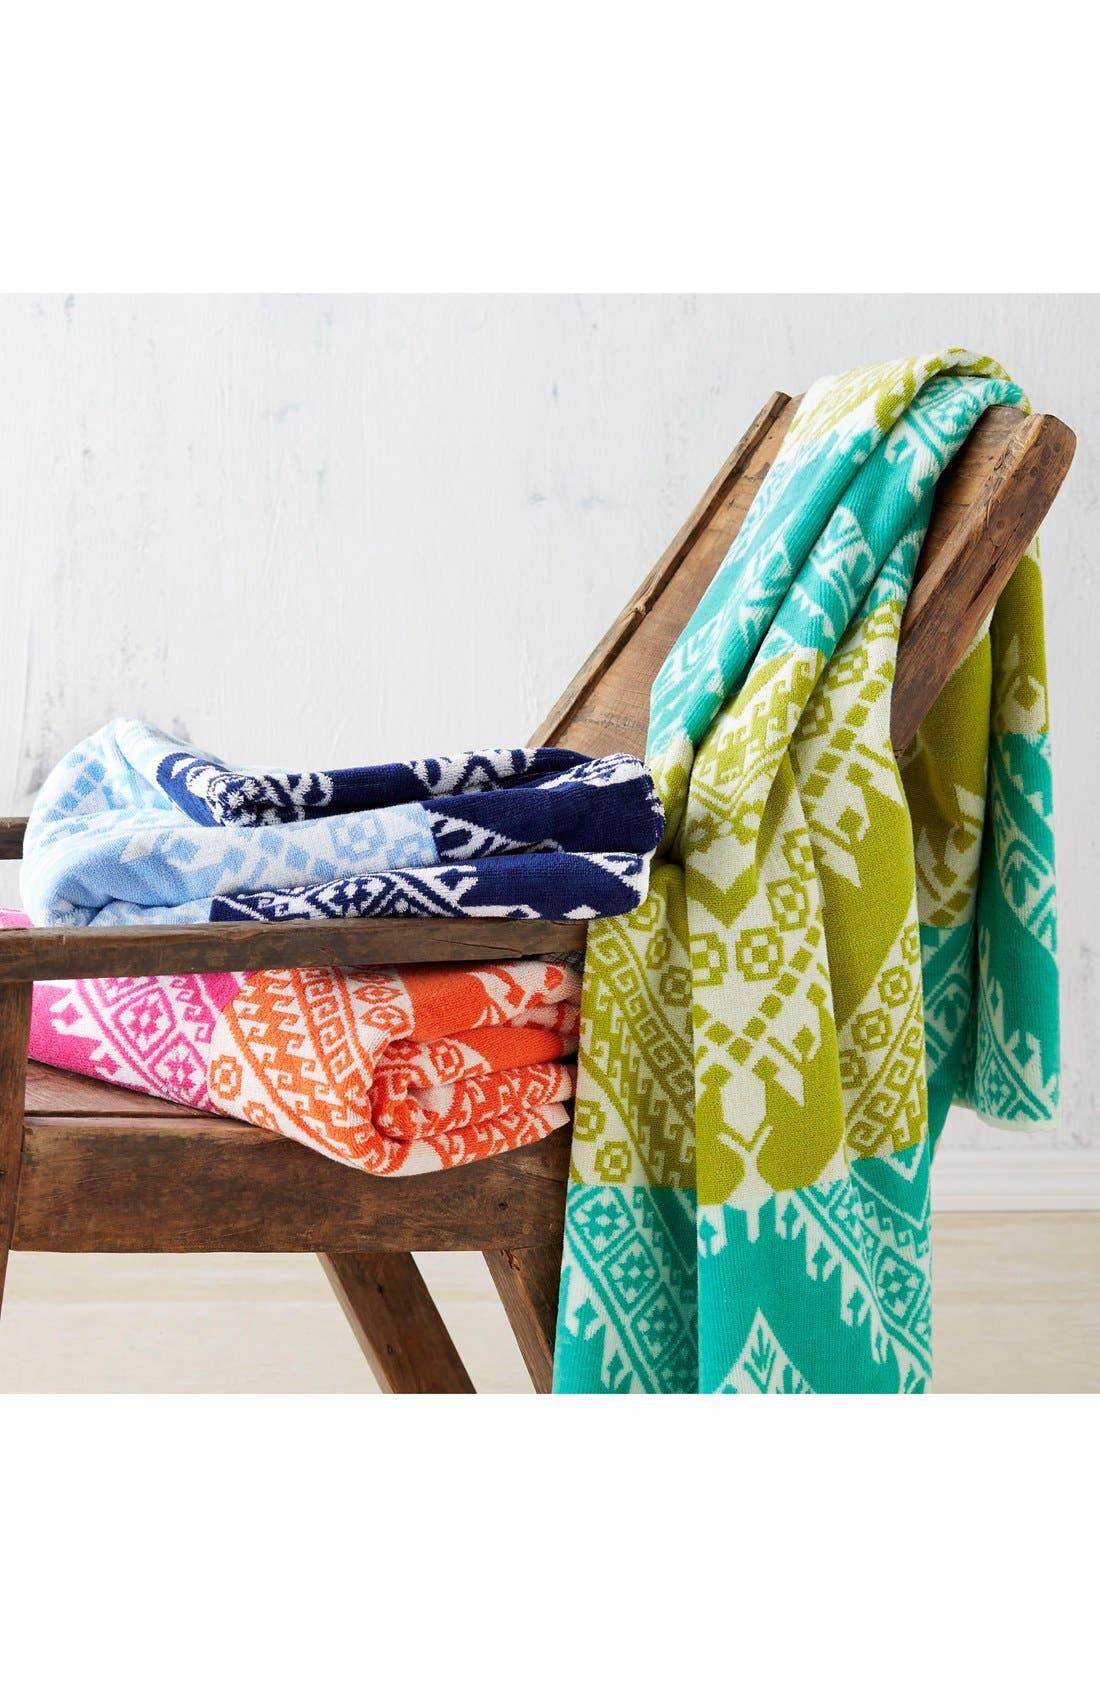 'Koh' Chevron Wave Pattern Beach Towel,                             Alternate thumbnail 3, color,                             400